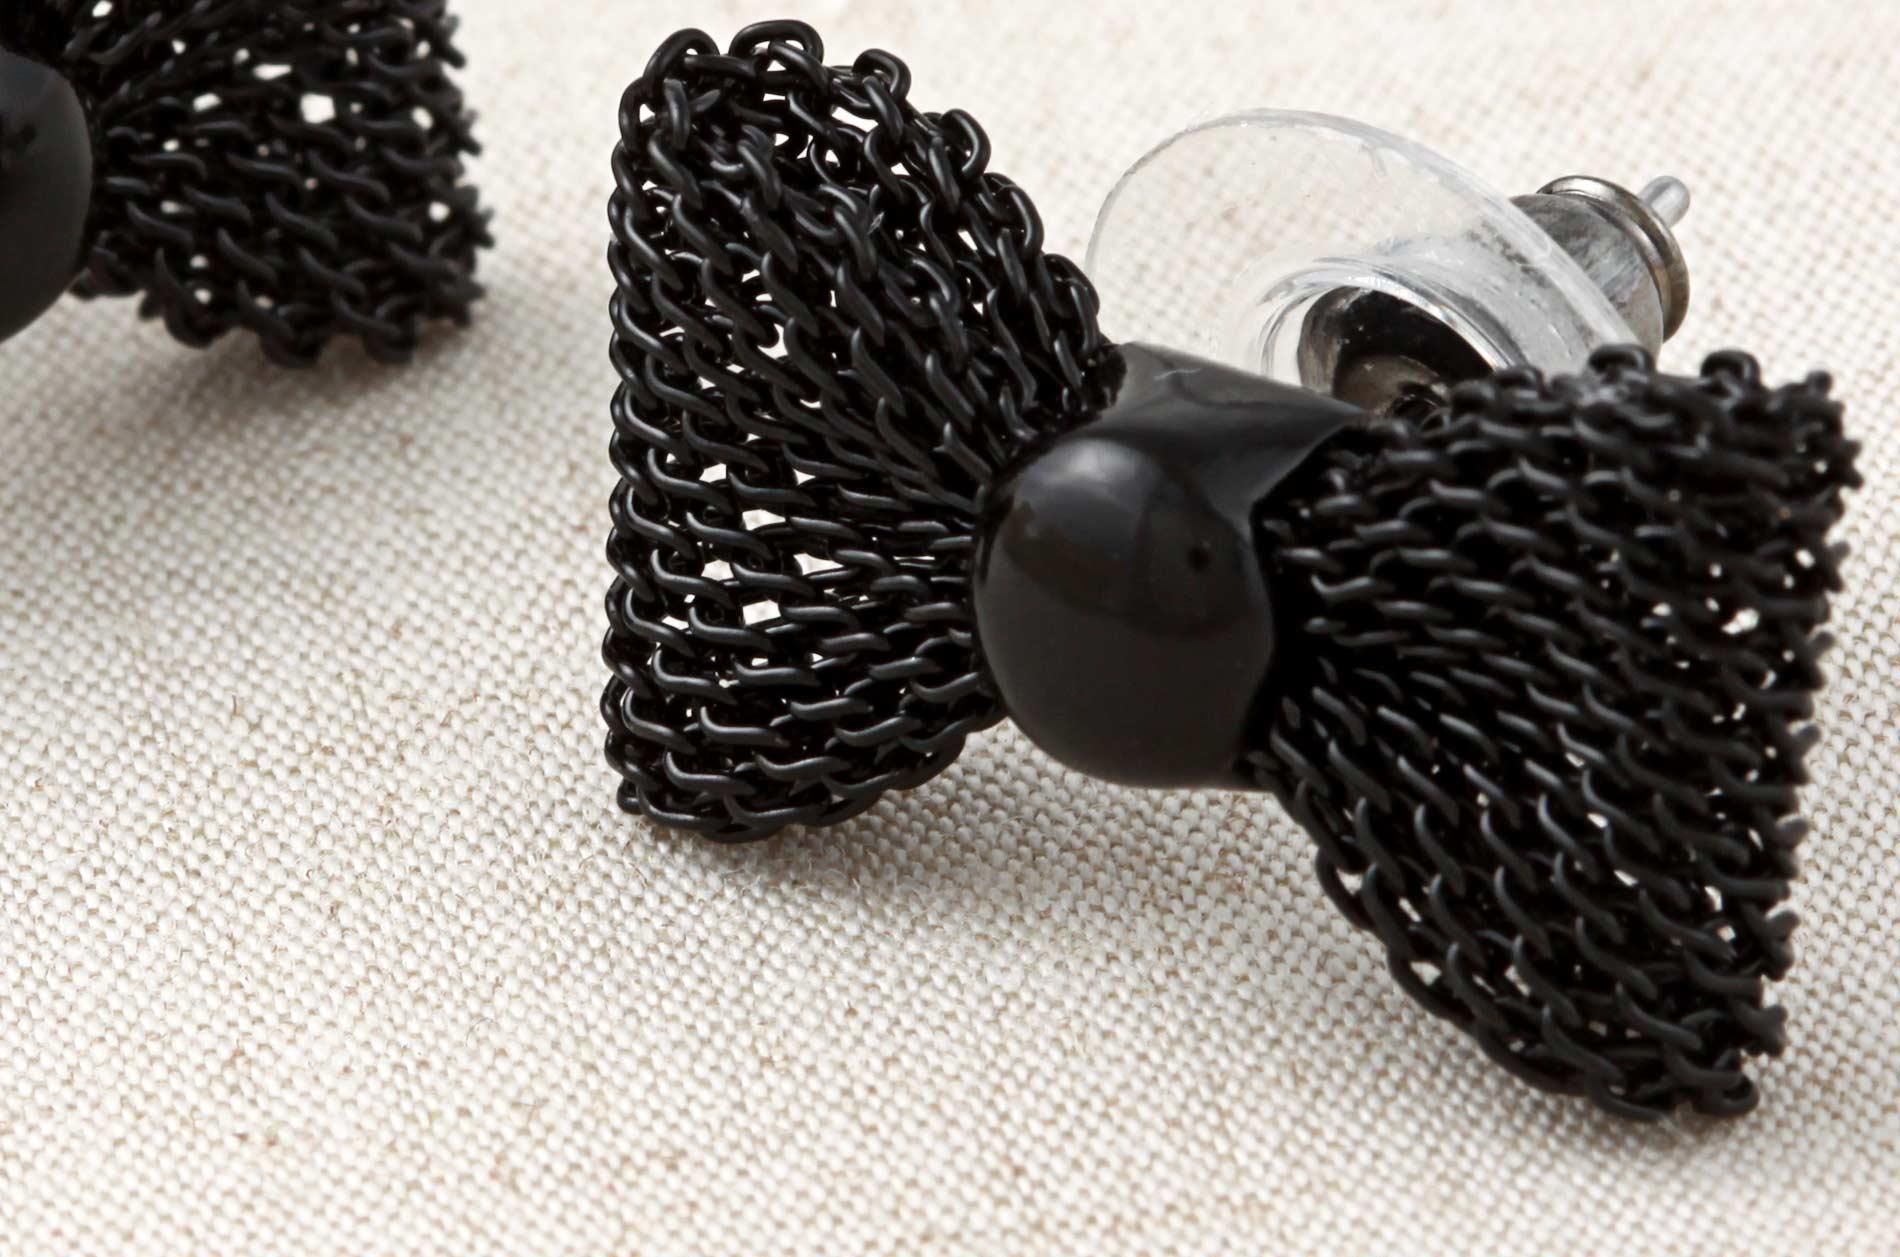 Betsey Johnson Black-plated Mesh Bowtie Stud Earrings - Thumbnail 2